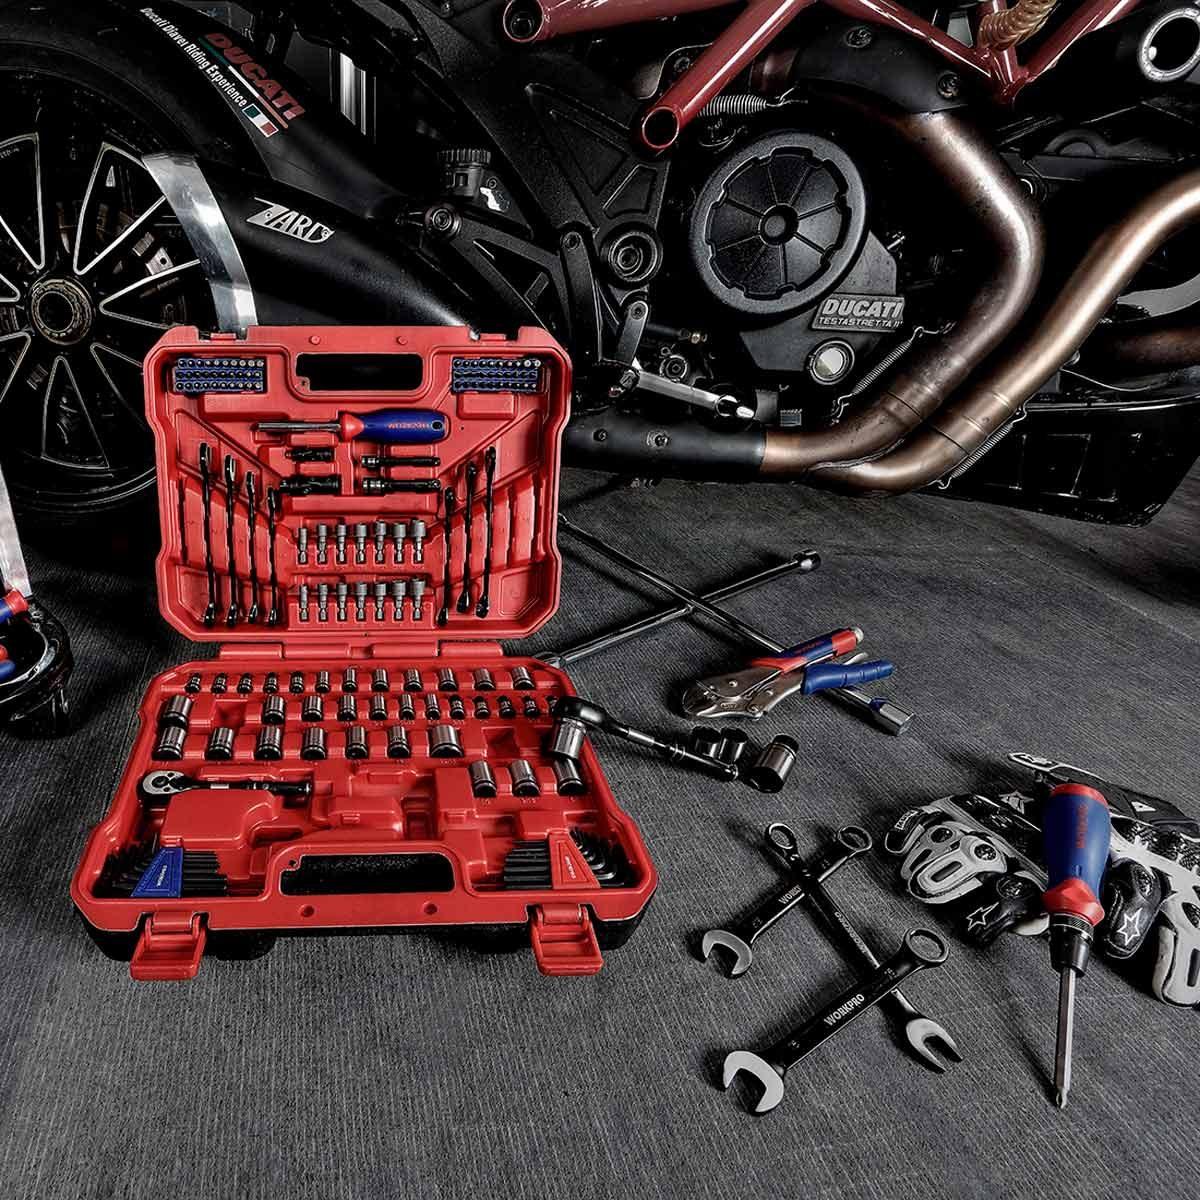 Mechanic's